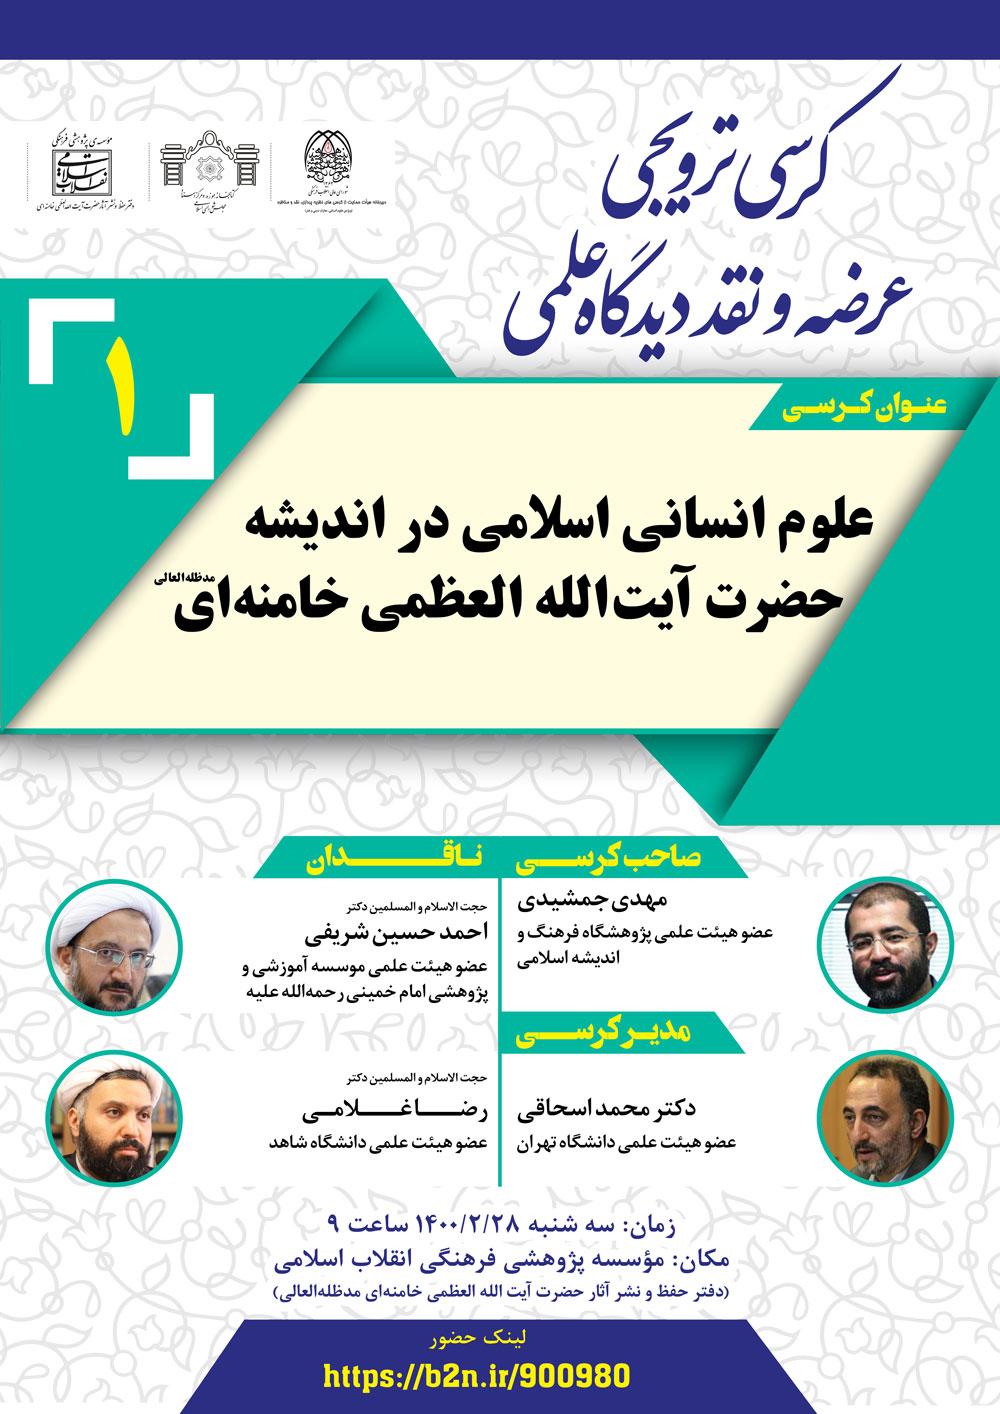 korsi0002262 - کرسی ترویجی «علوم انسانی اسلامی در اندیشه حضرت آیت الله العظمی خامنهای» برگزار میشود